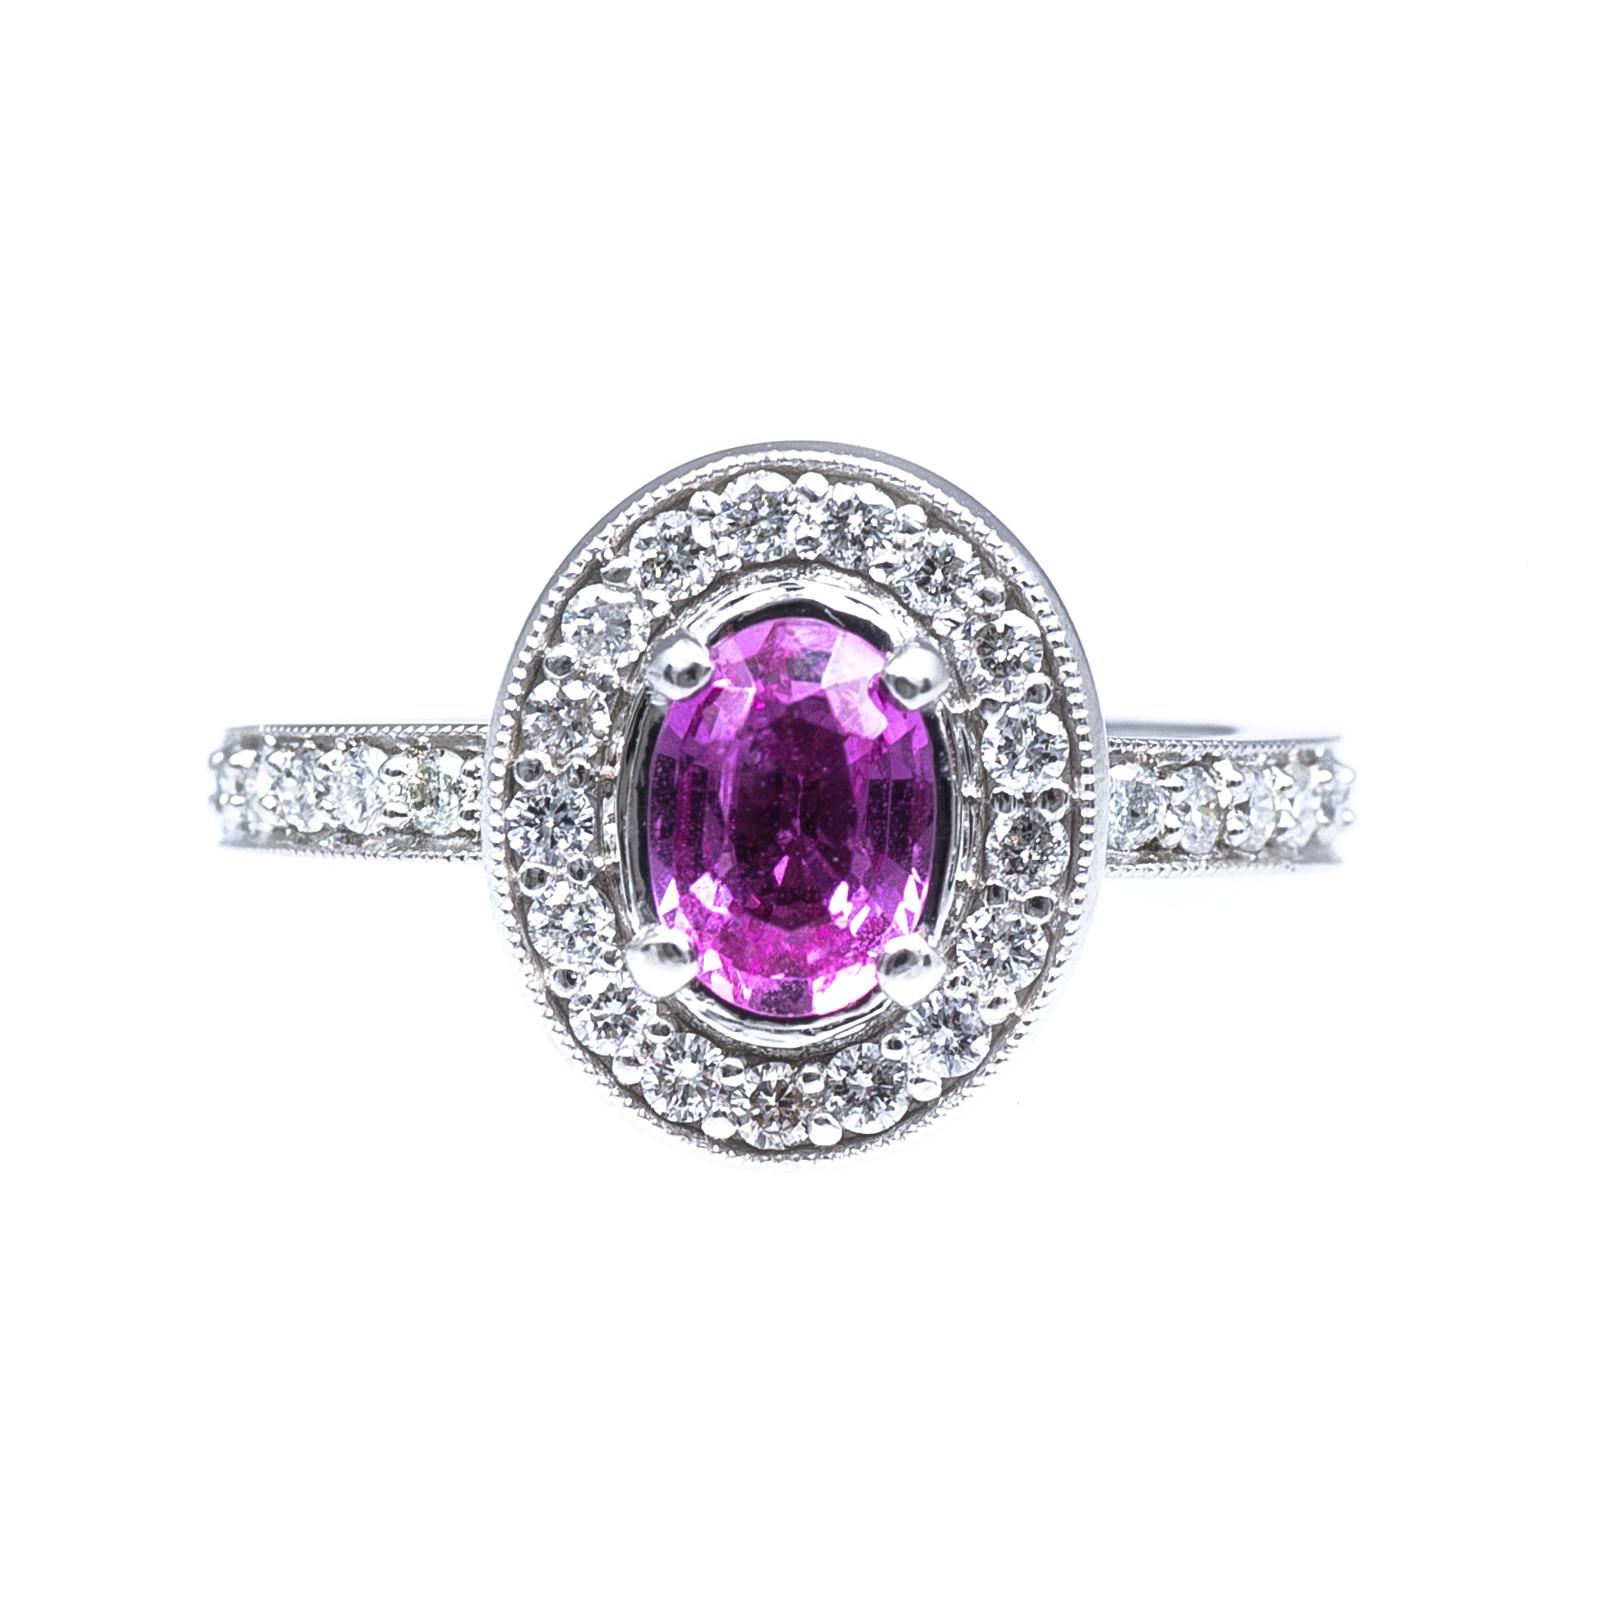 Vintage 1.69 CTW Diamond & Pink Sapphire Ring